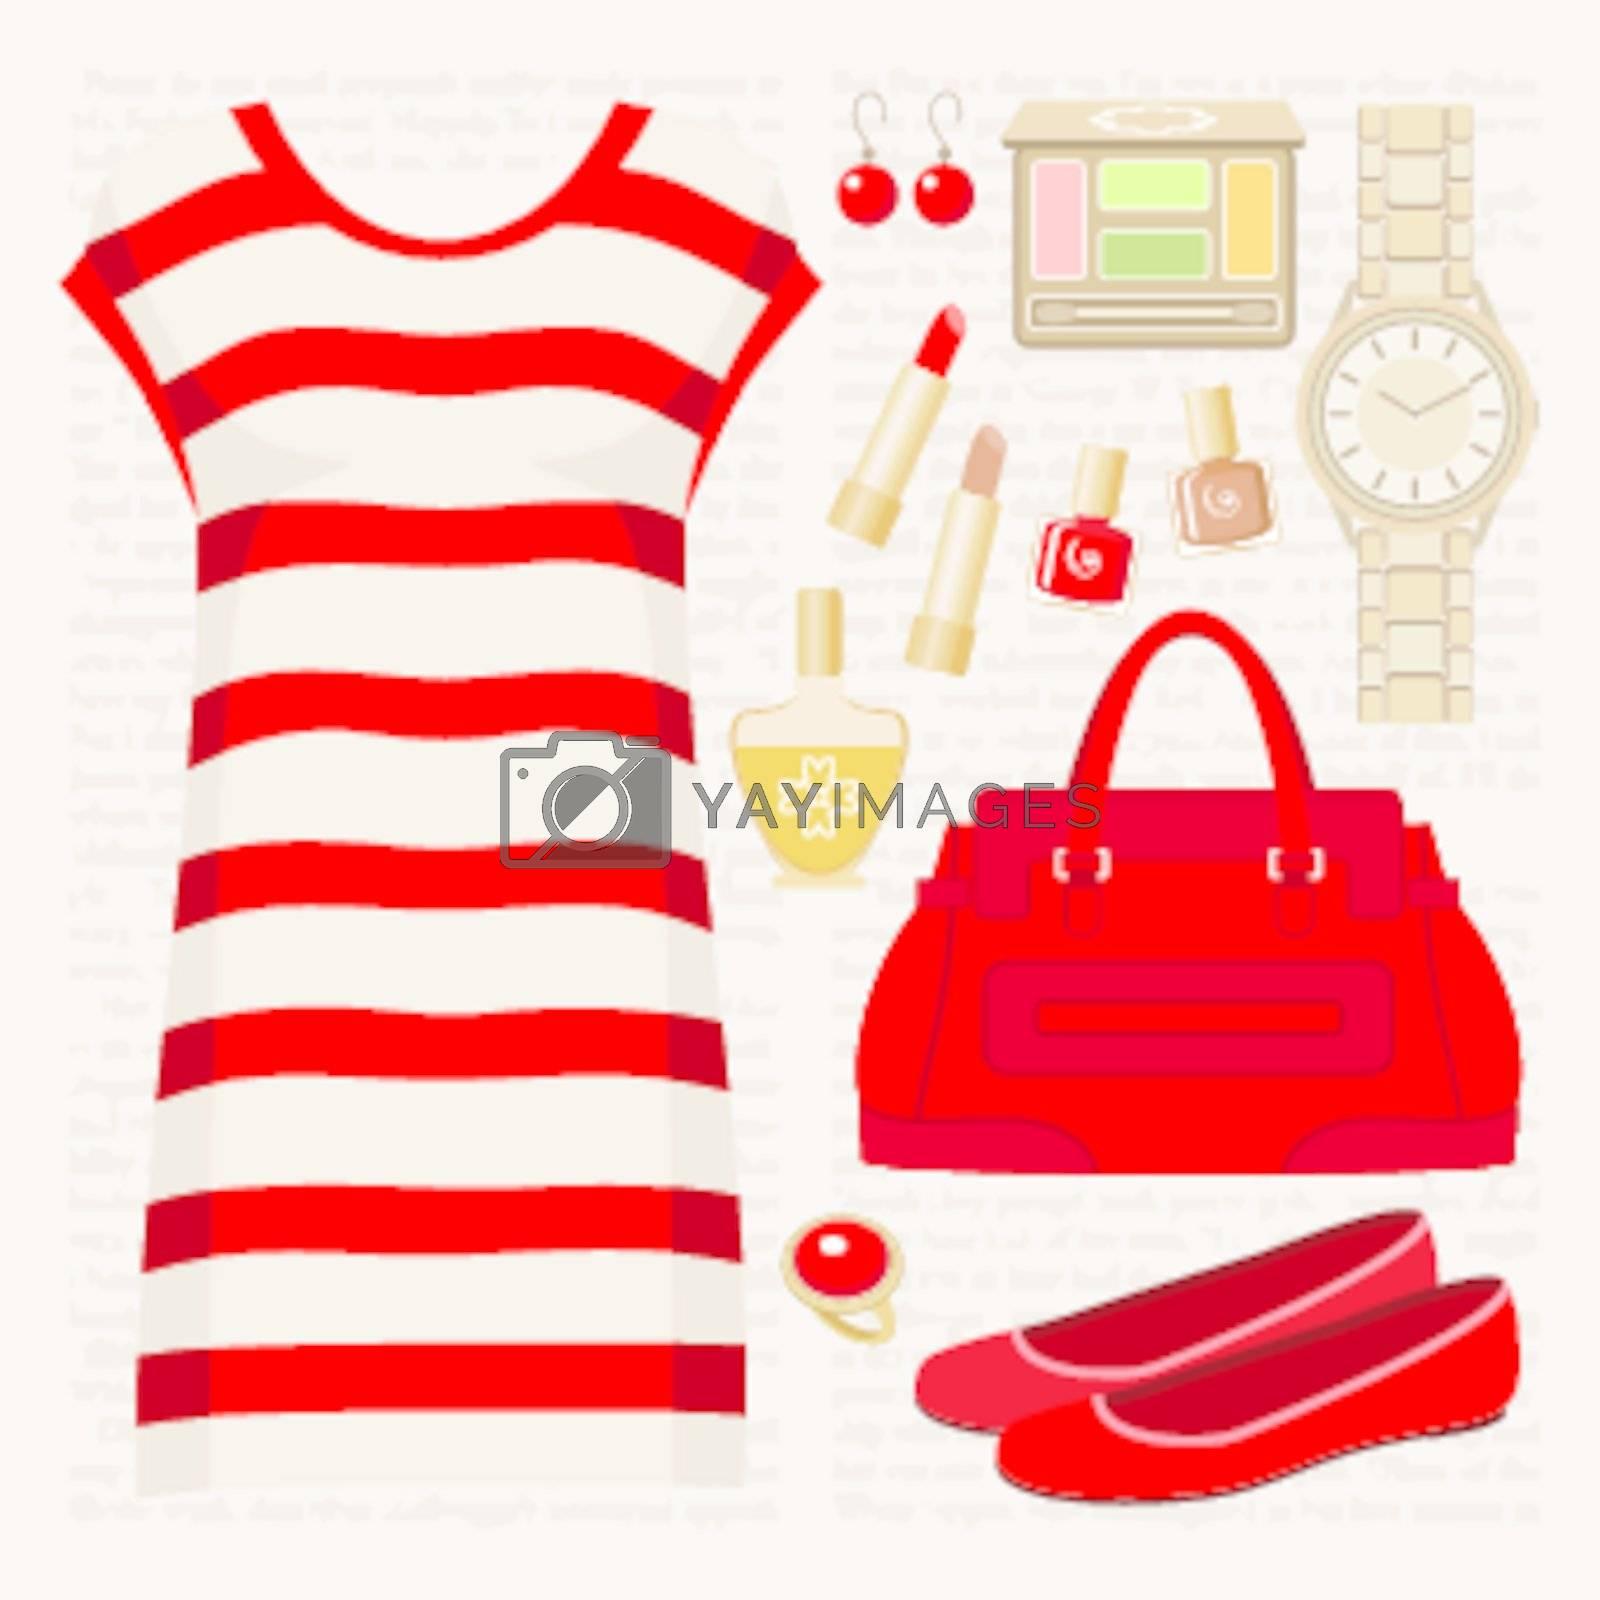 Fashion set with a tunic